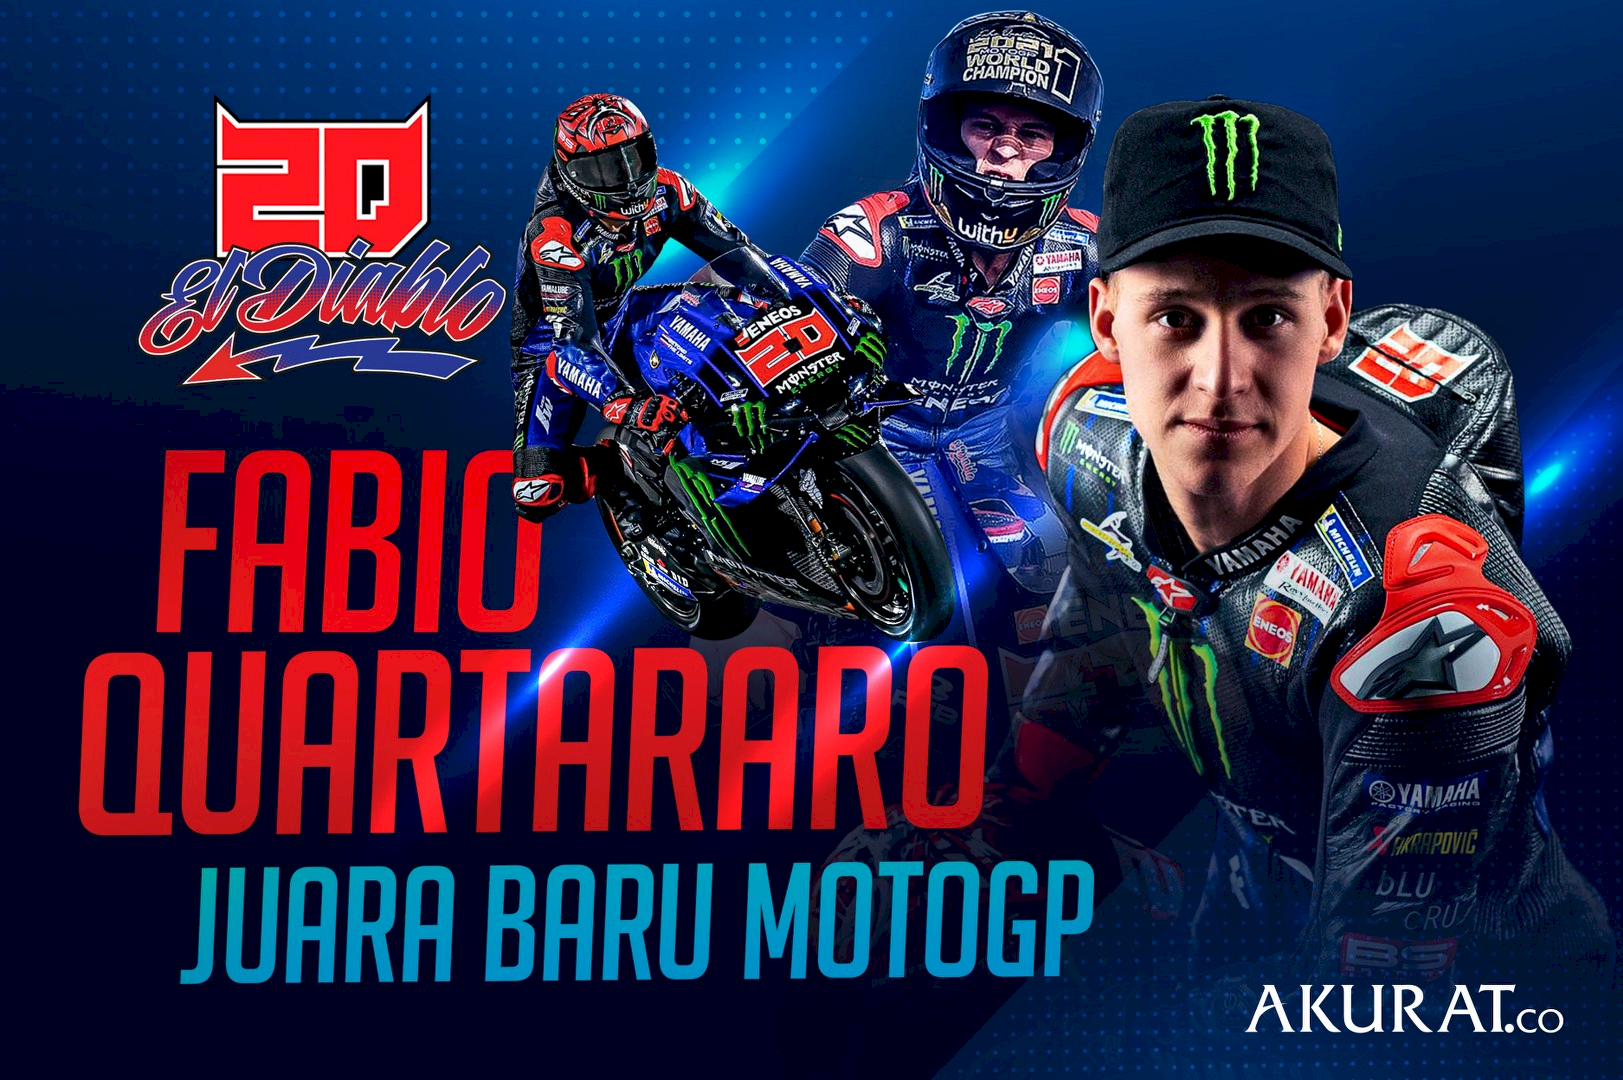 Fabio Quartararo Juara Baru MotoGP